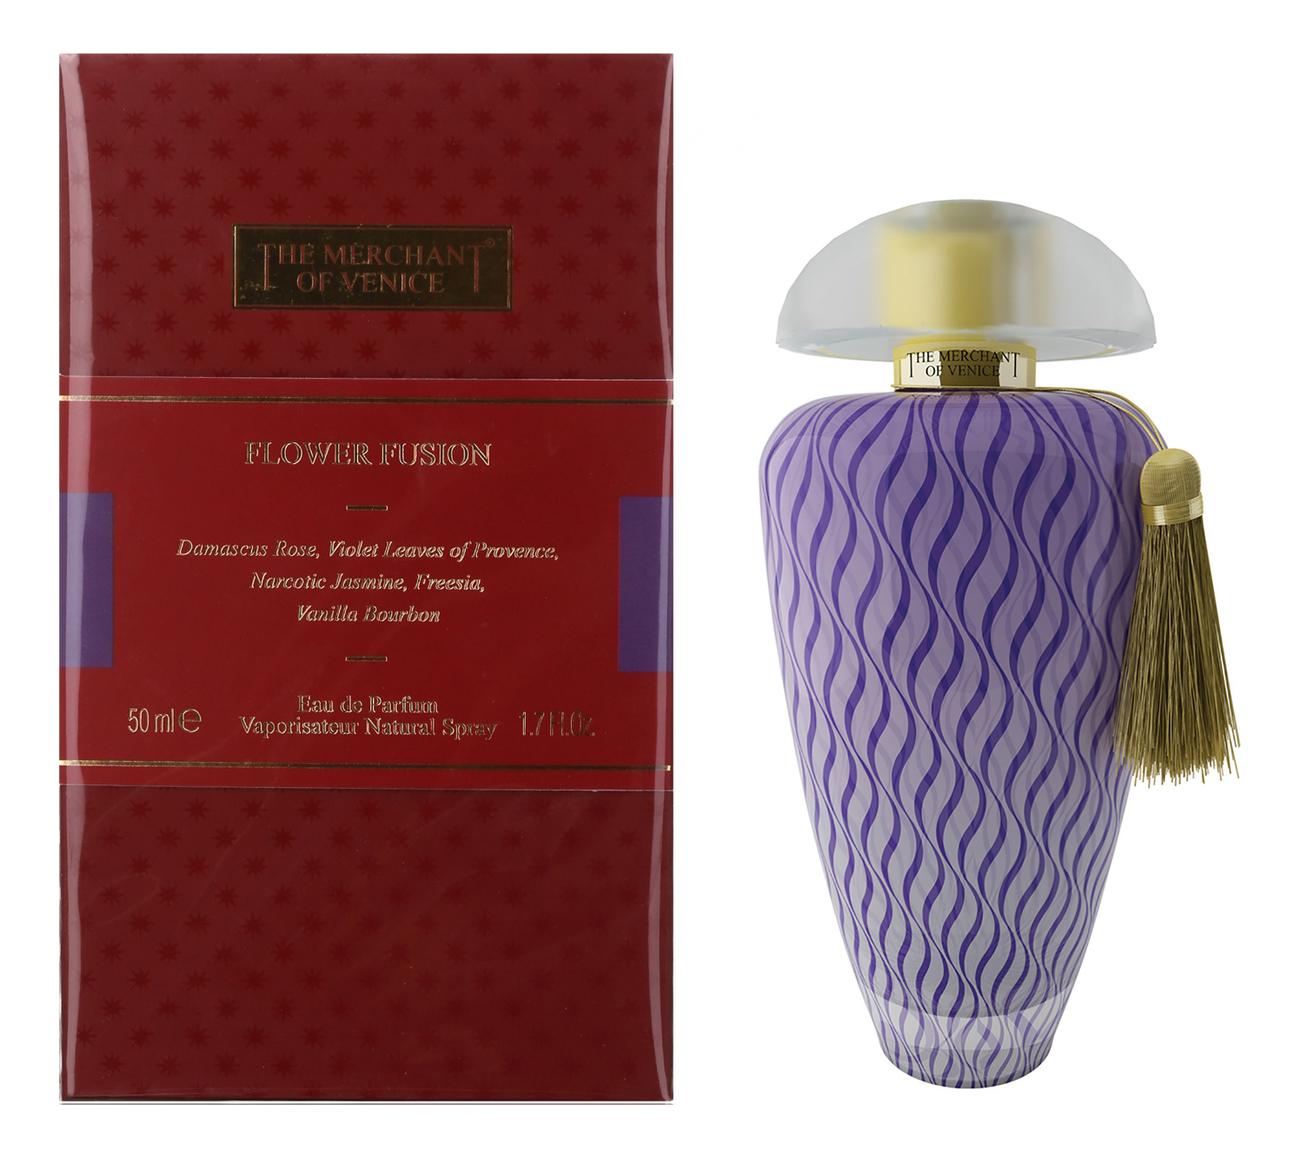 The Merchant Of Venice Flower Fusion: парфюмерная вода 50мл